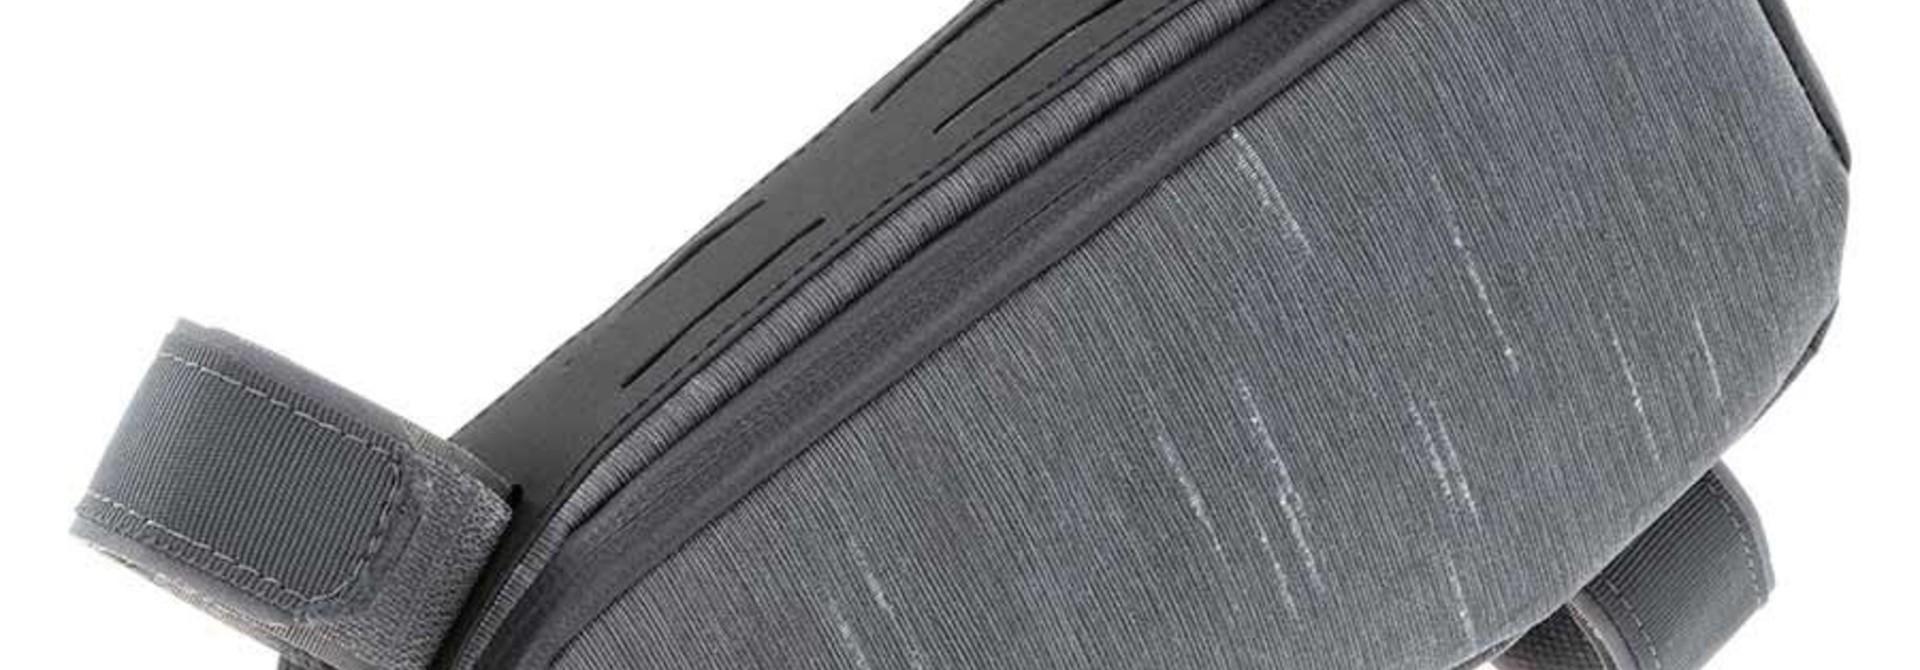 EVOC, Multi Frame Bag, Carbon Gray